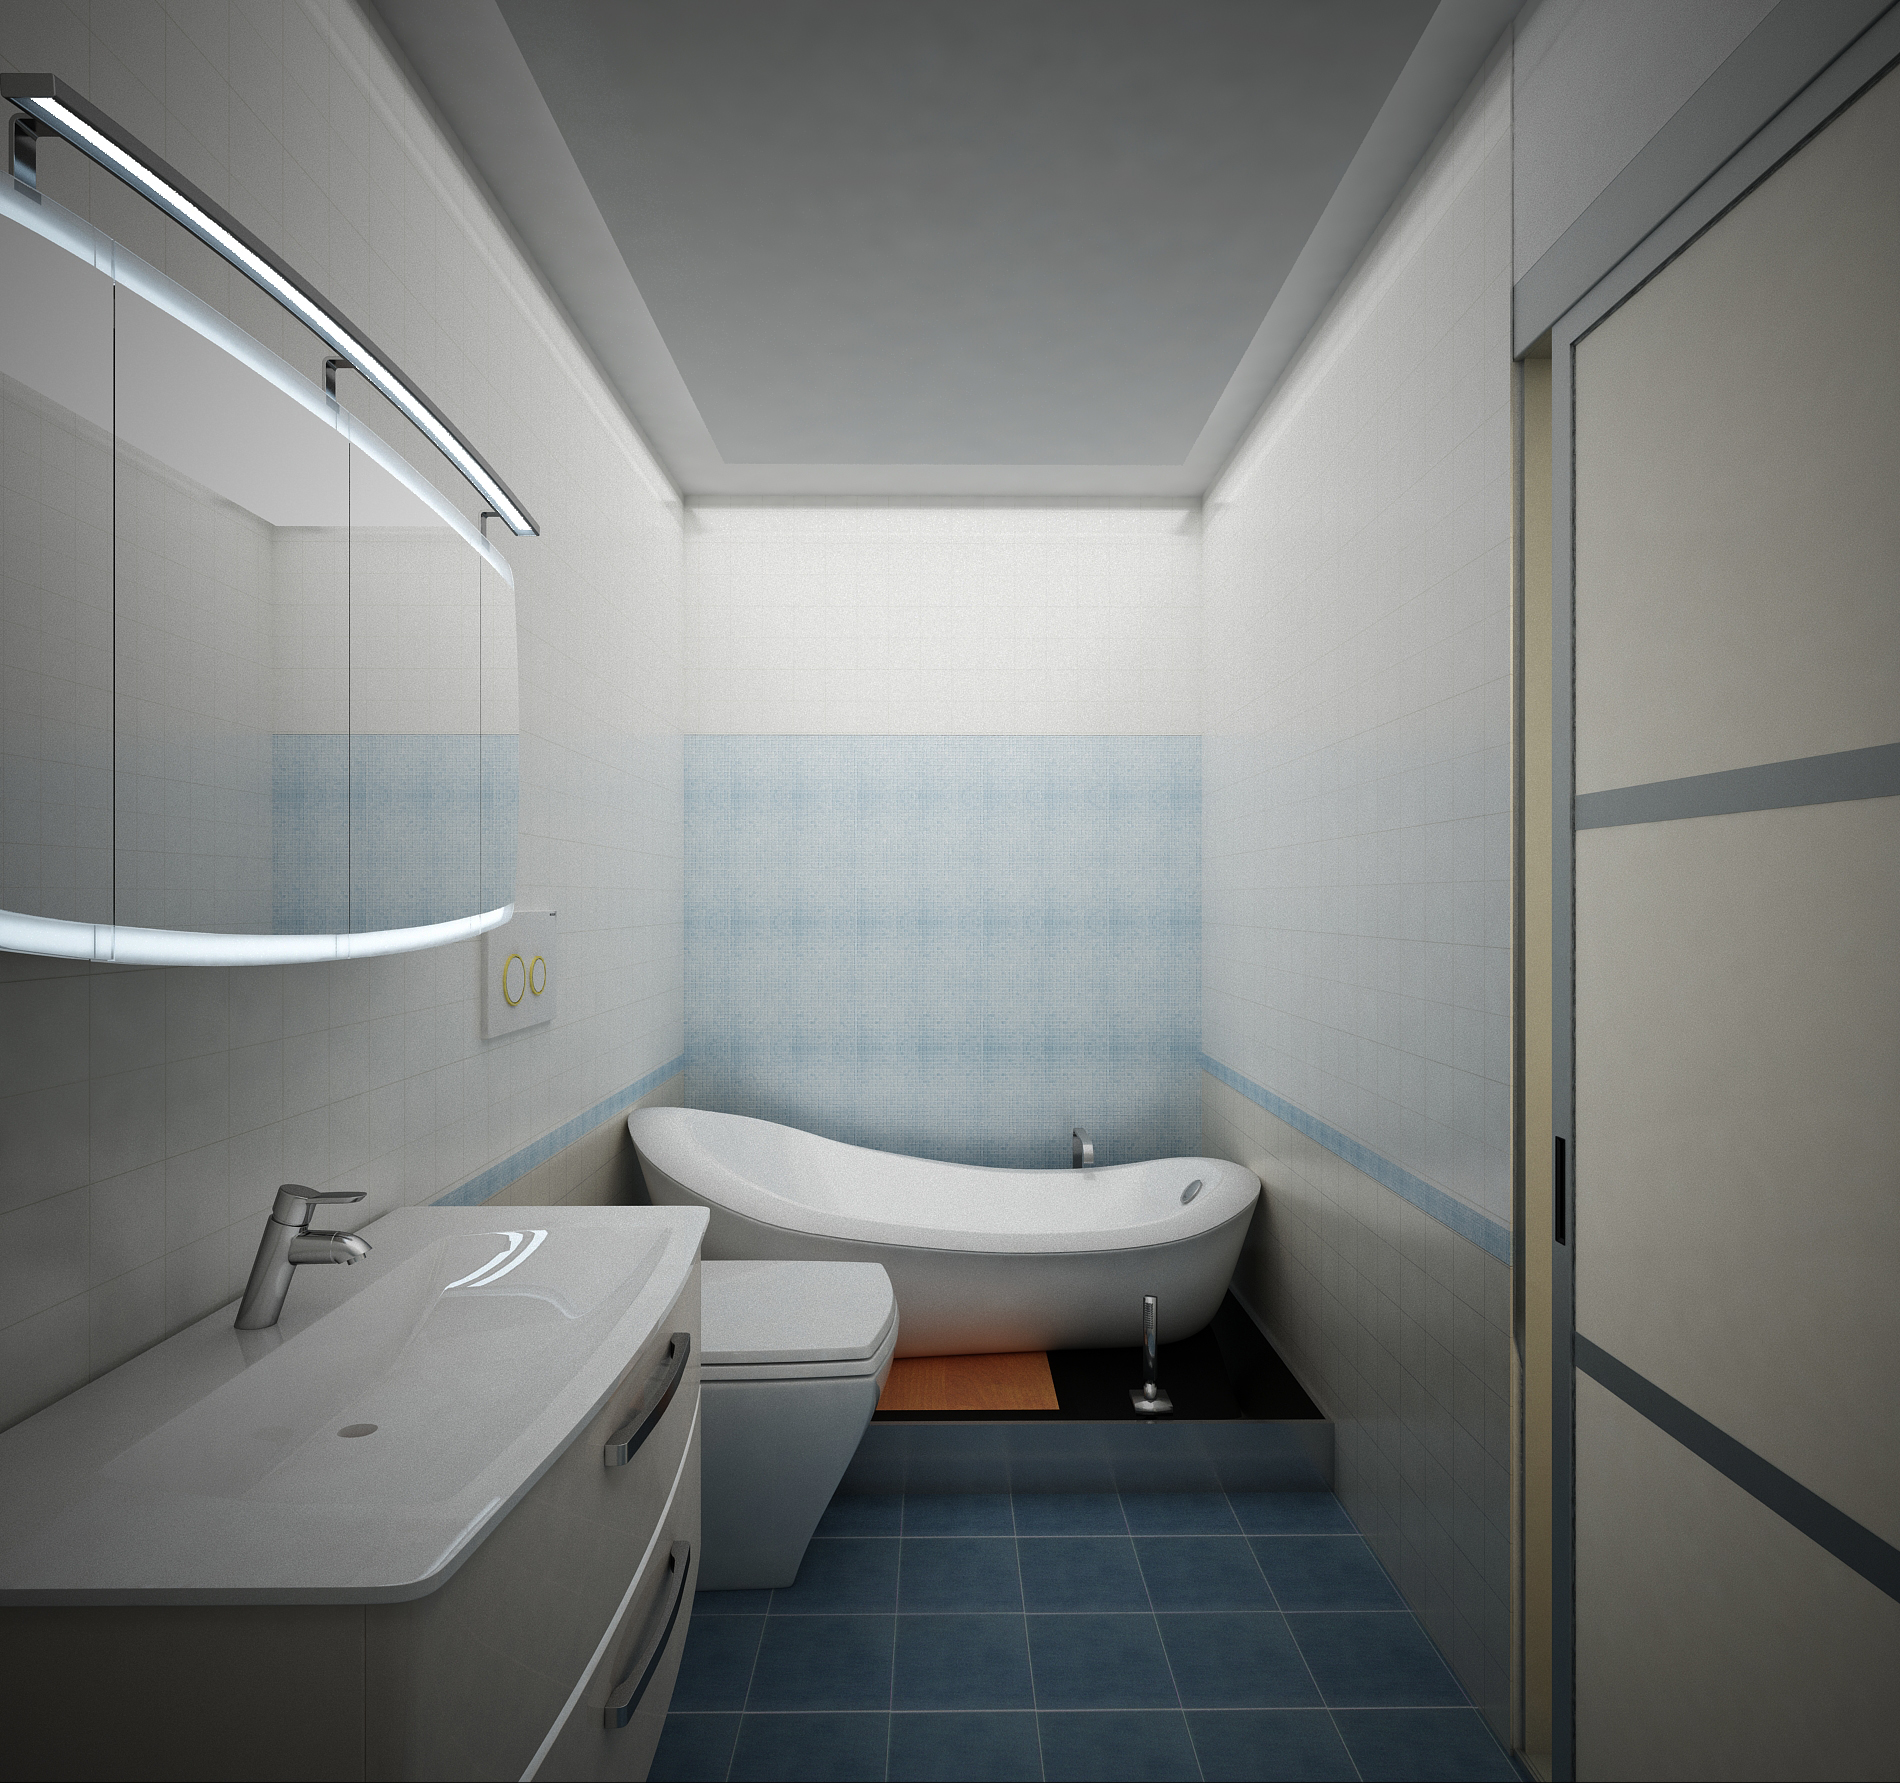 06-House Bath v10